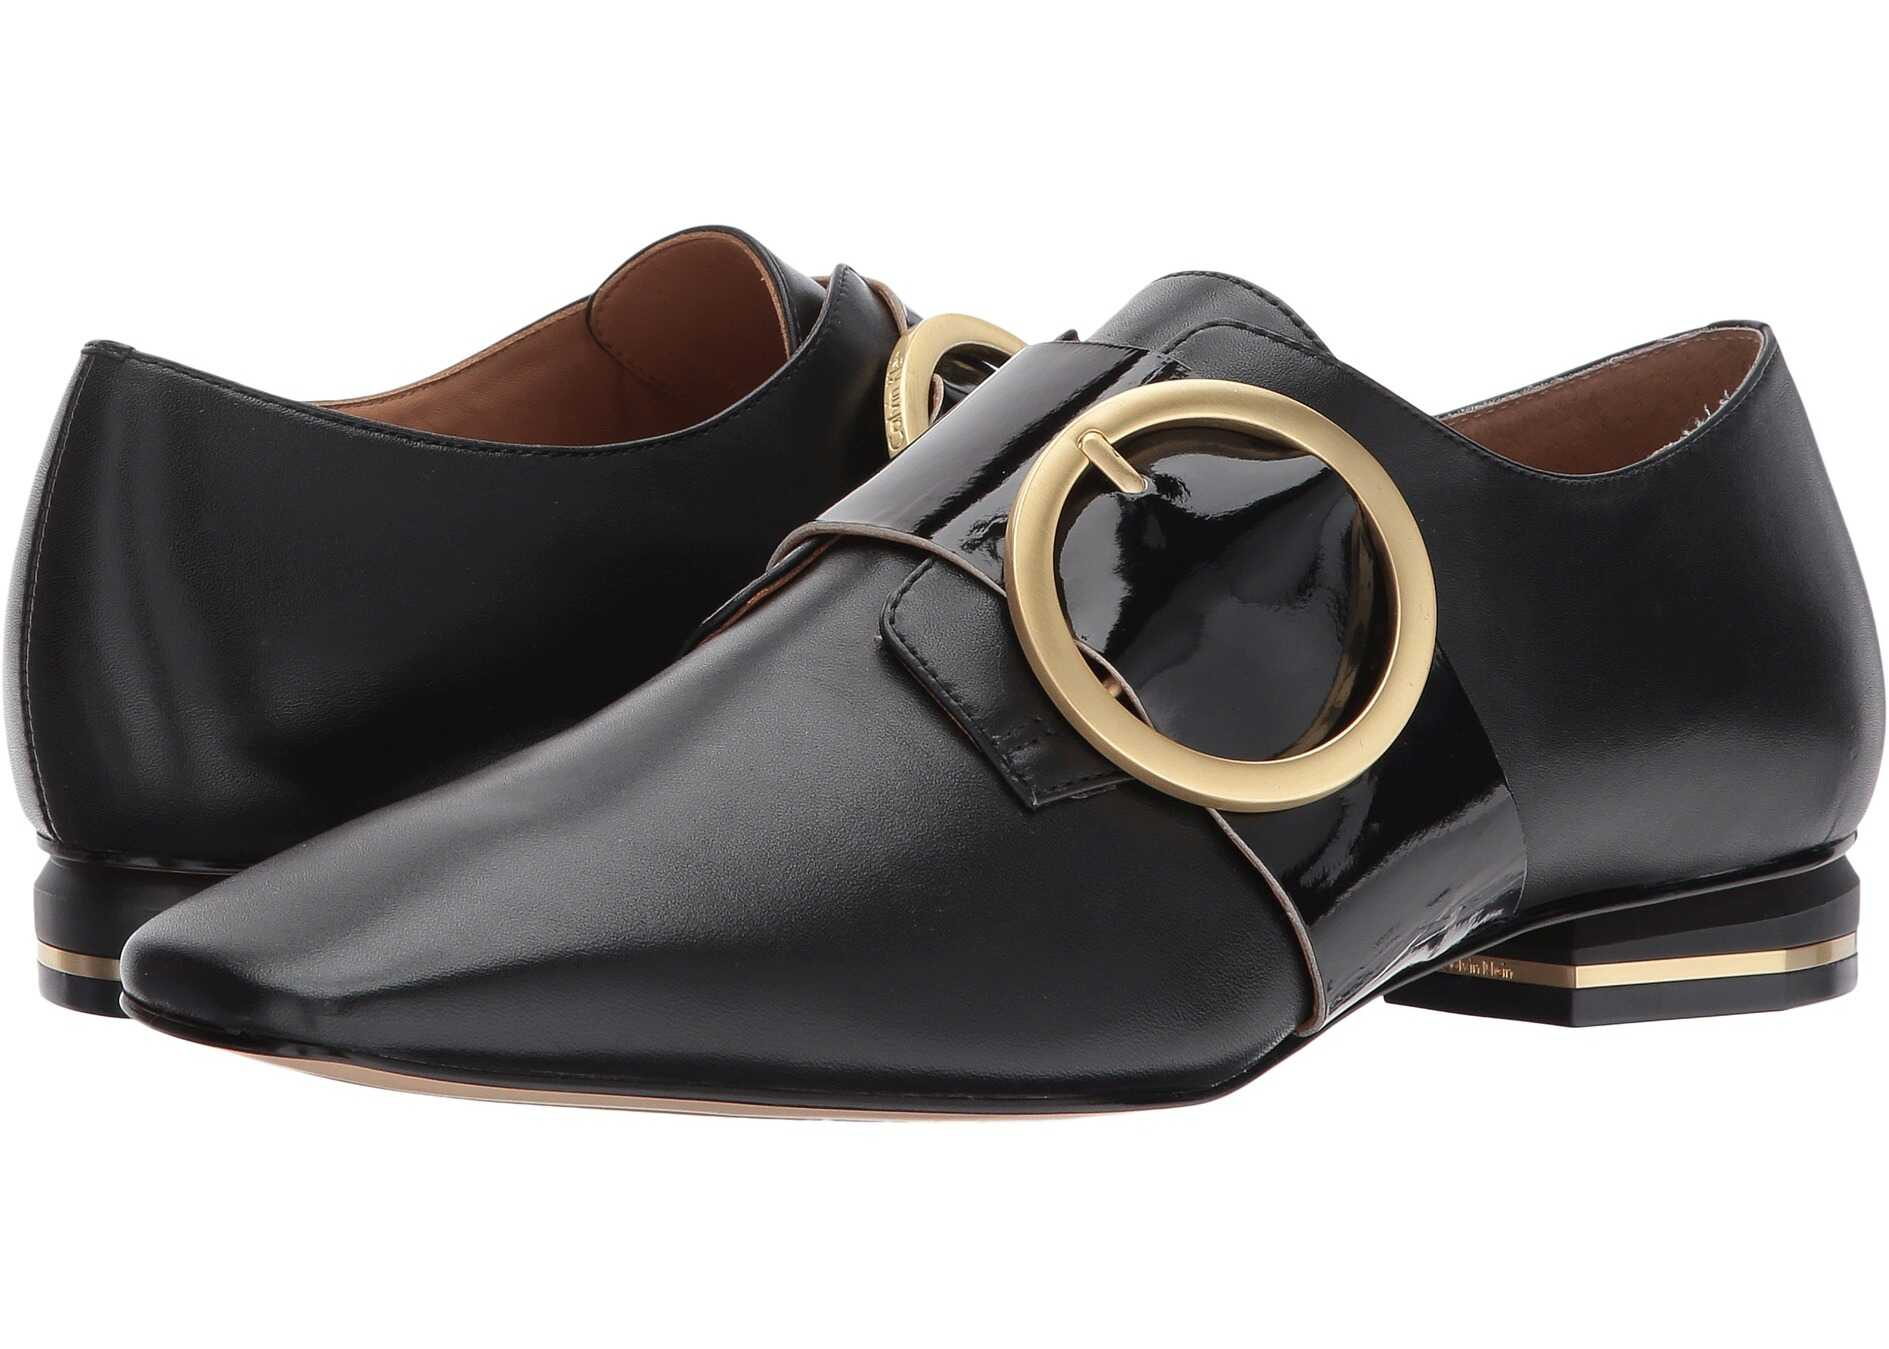 Calvin Klein Bessy Black Smooth Calf/Soft Patent